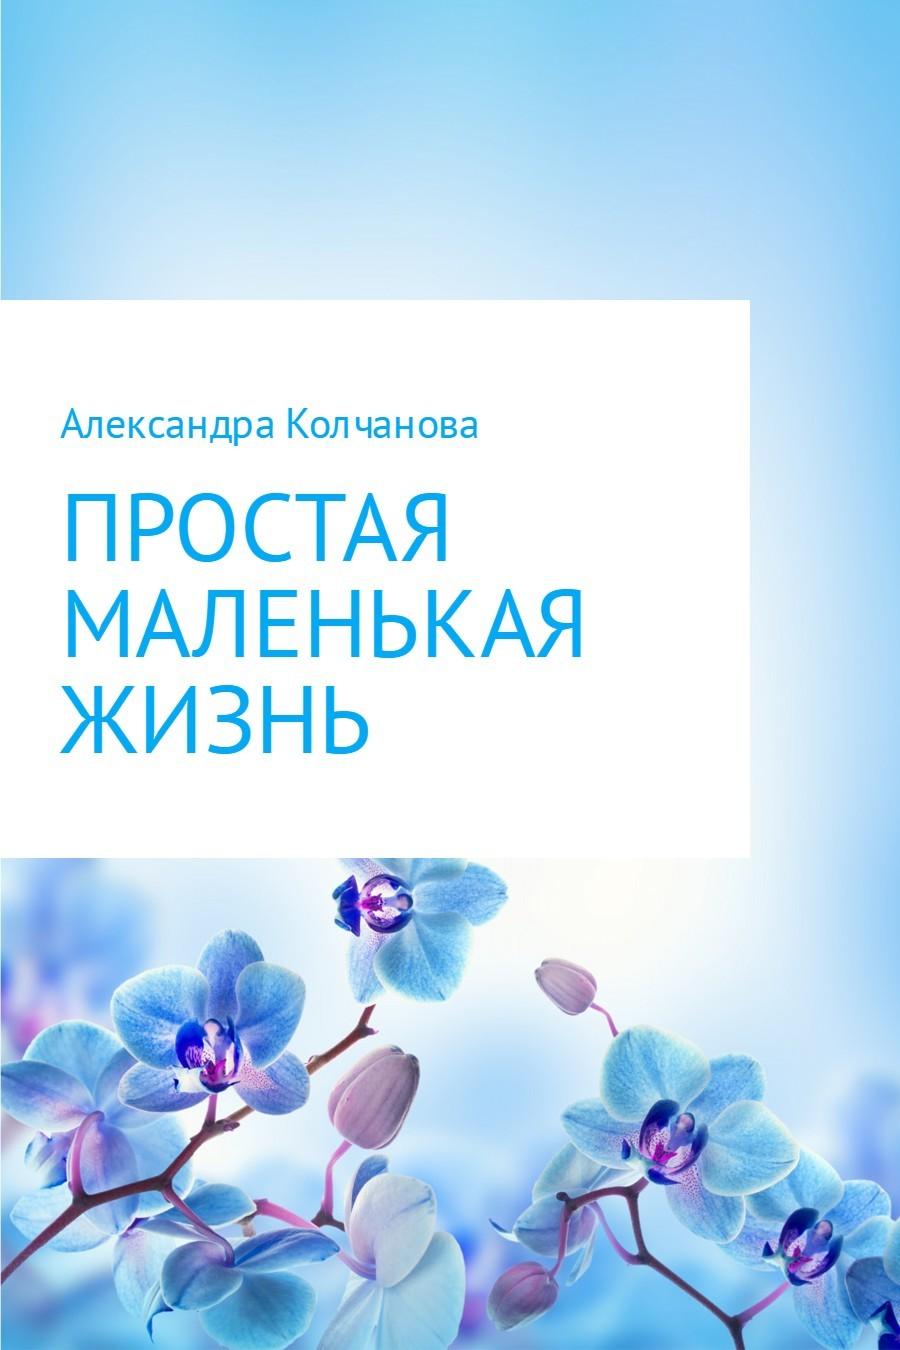 Александра Колчанова бесплатно